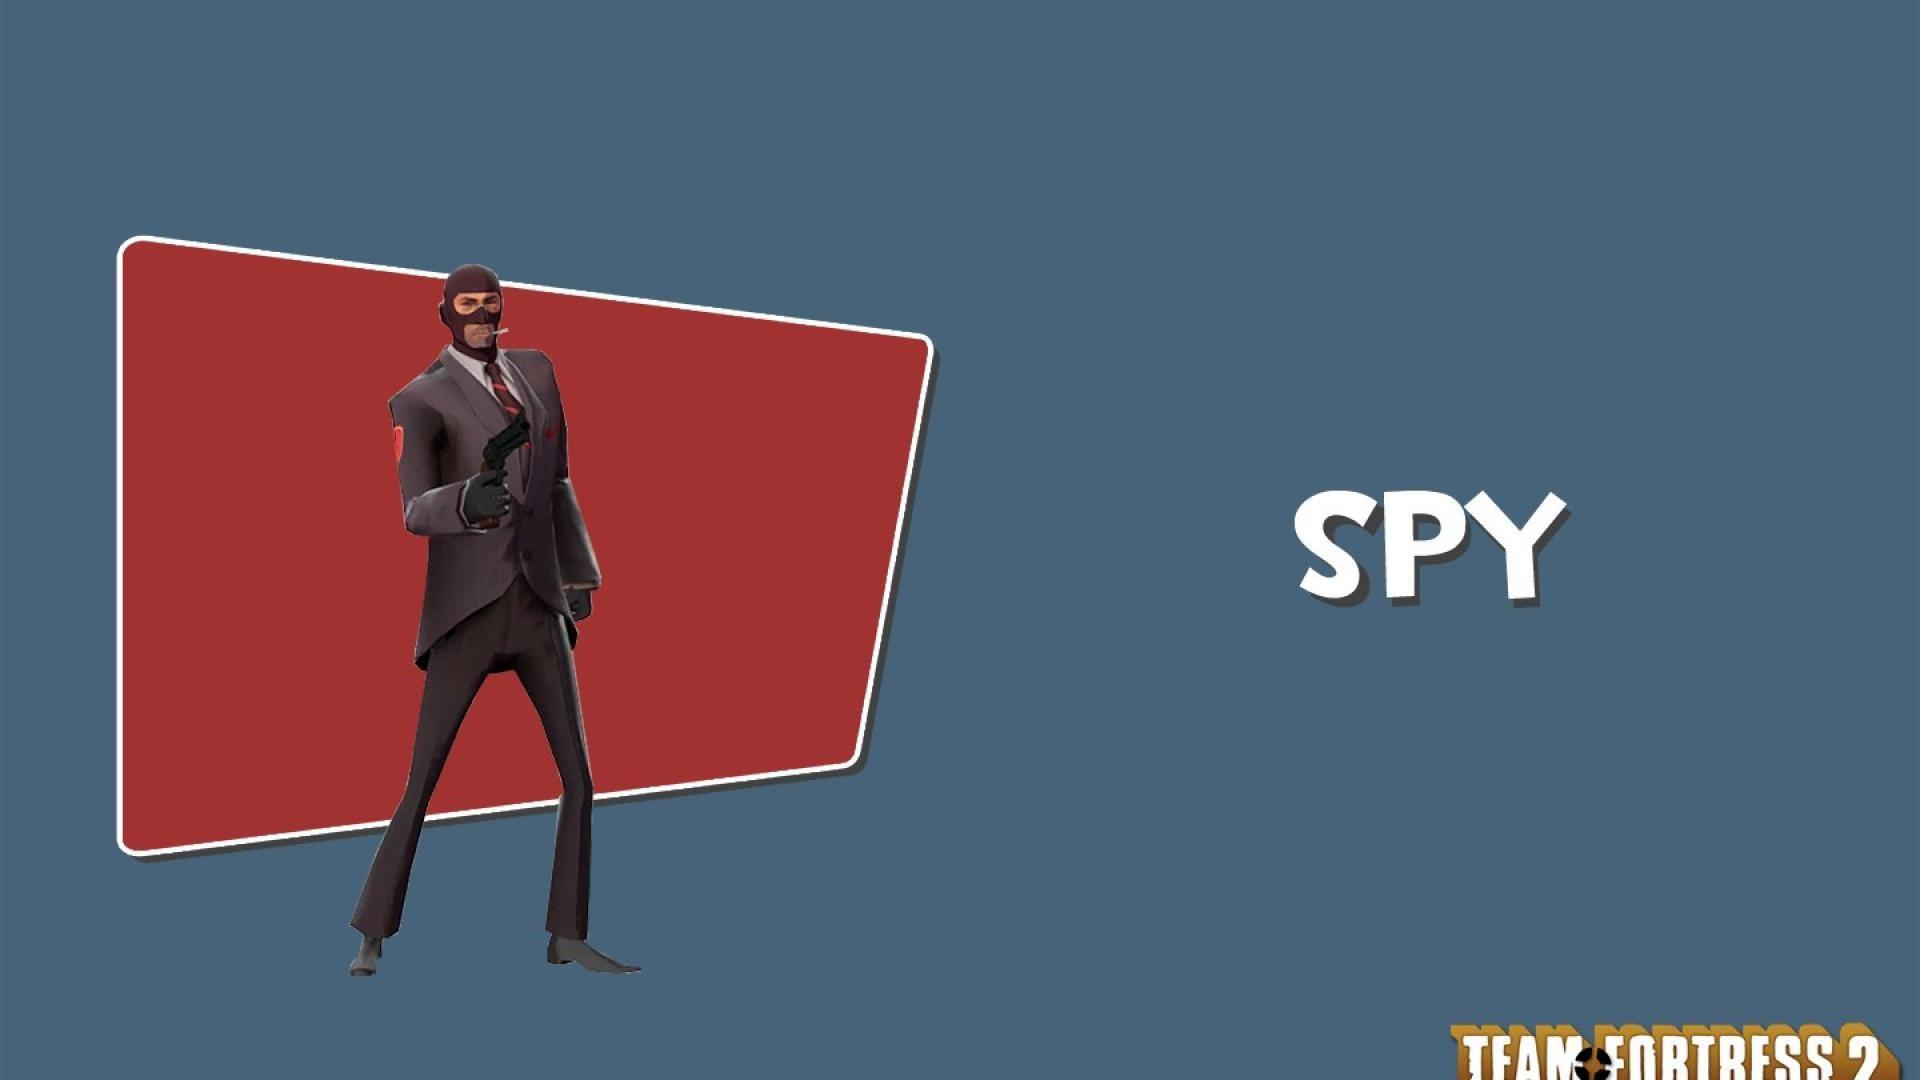 spy team fortress tf2 hd wallpaper – (#13) – HQ Desktop Wallpapers .